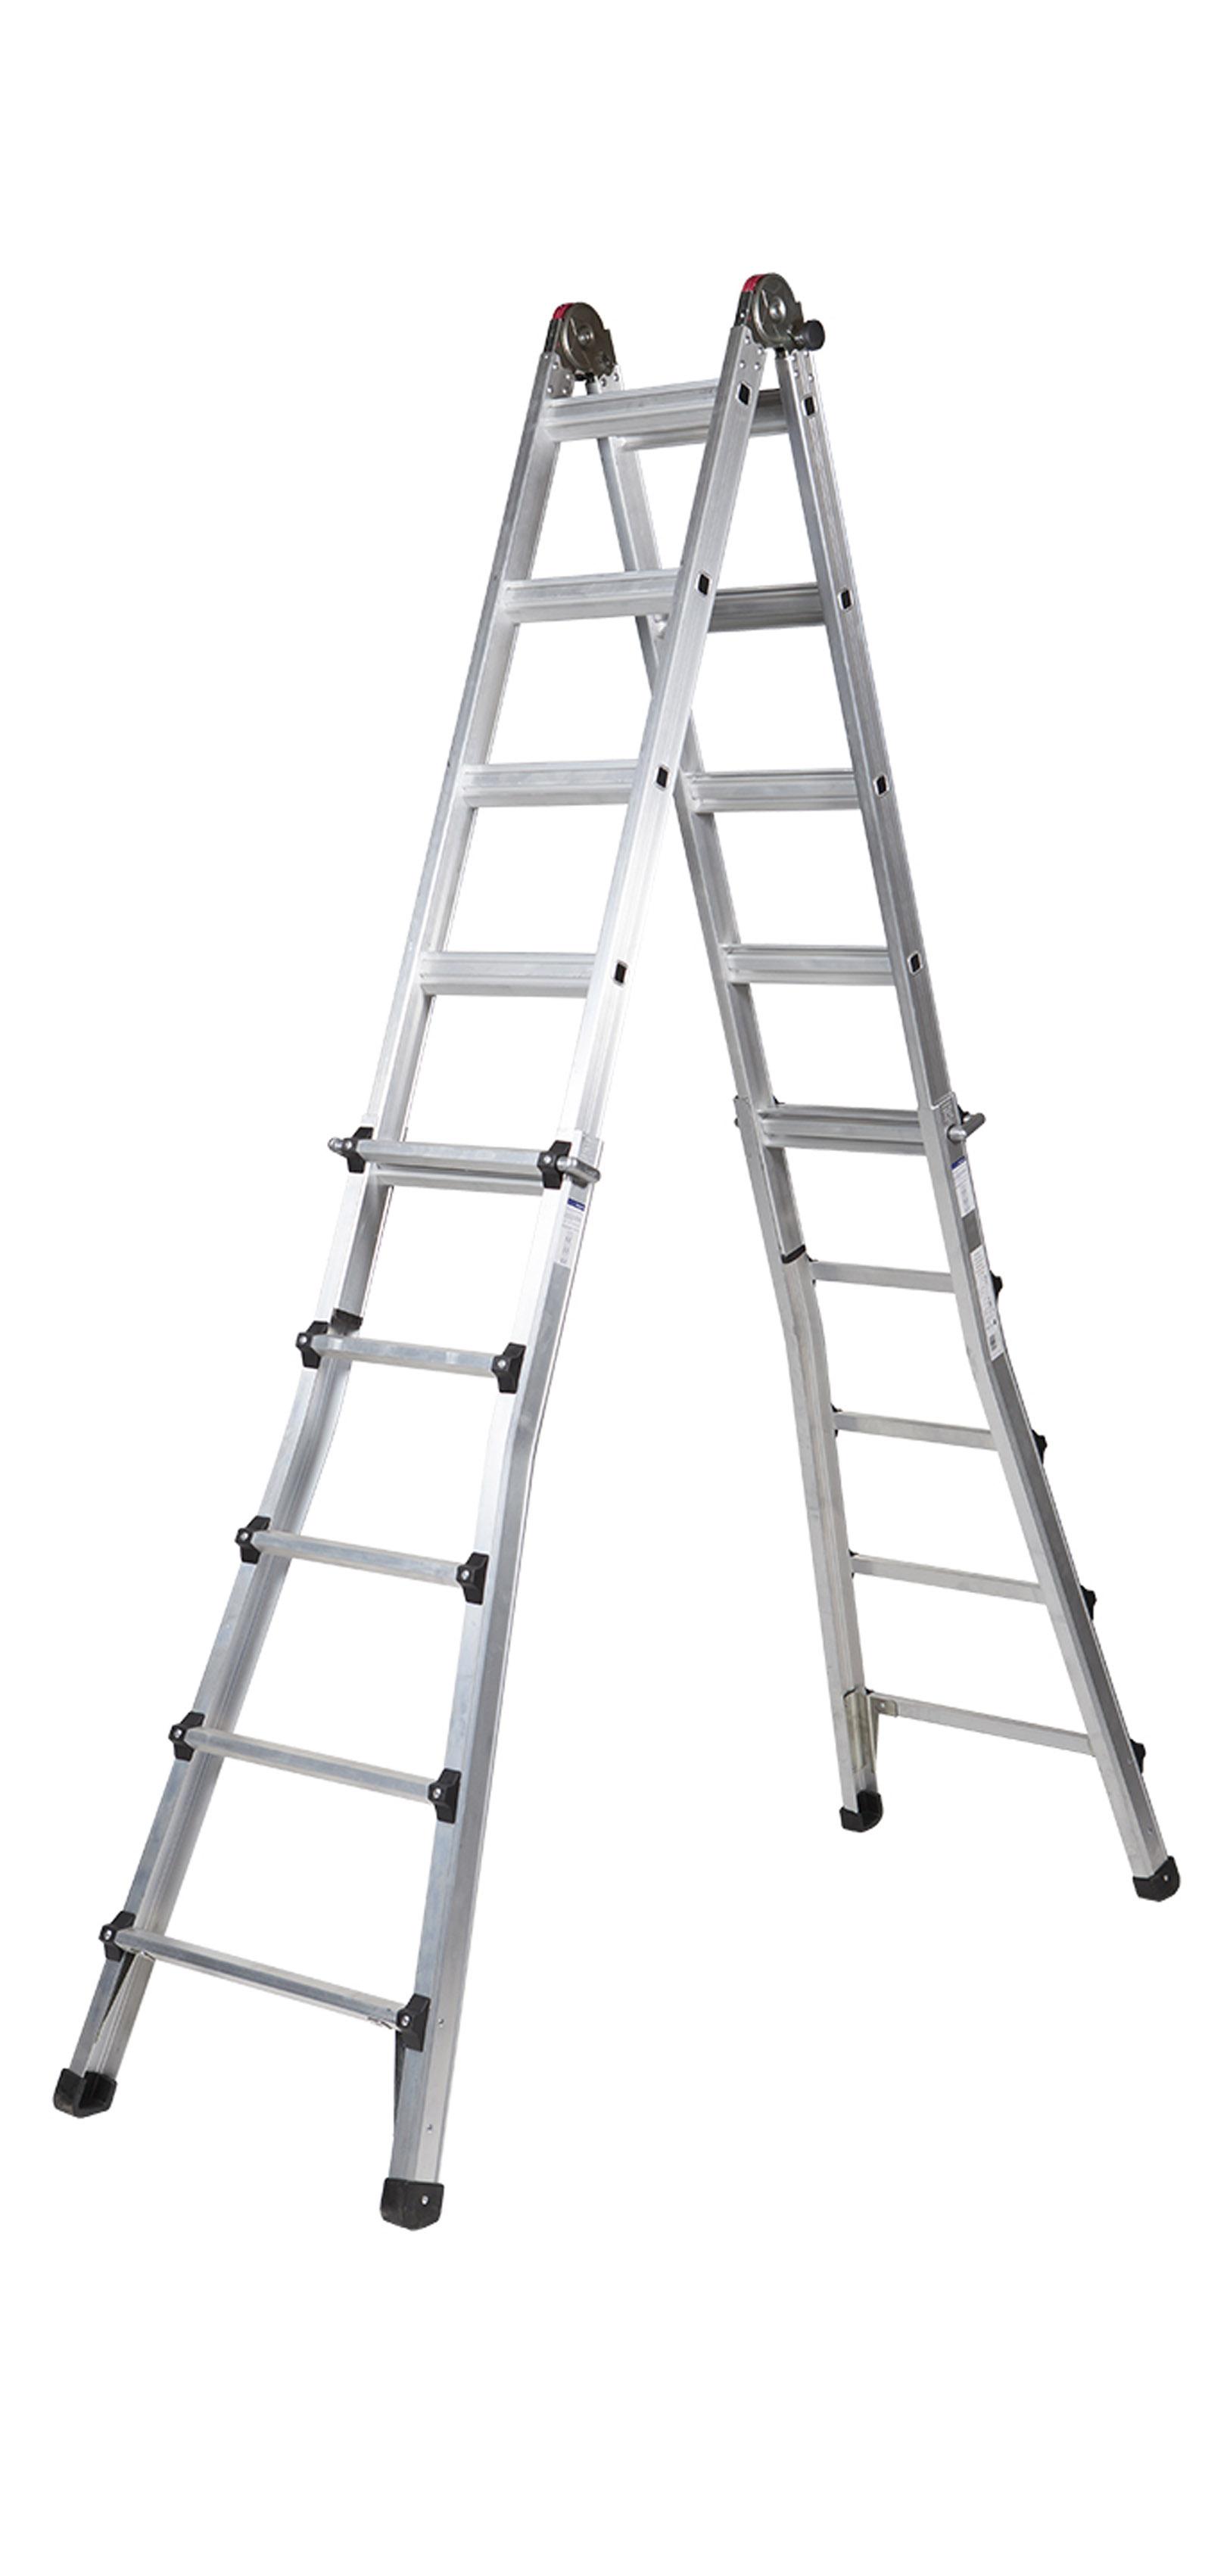 Aluminium Double-sided Telescopic Ladder